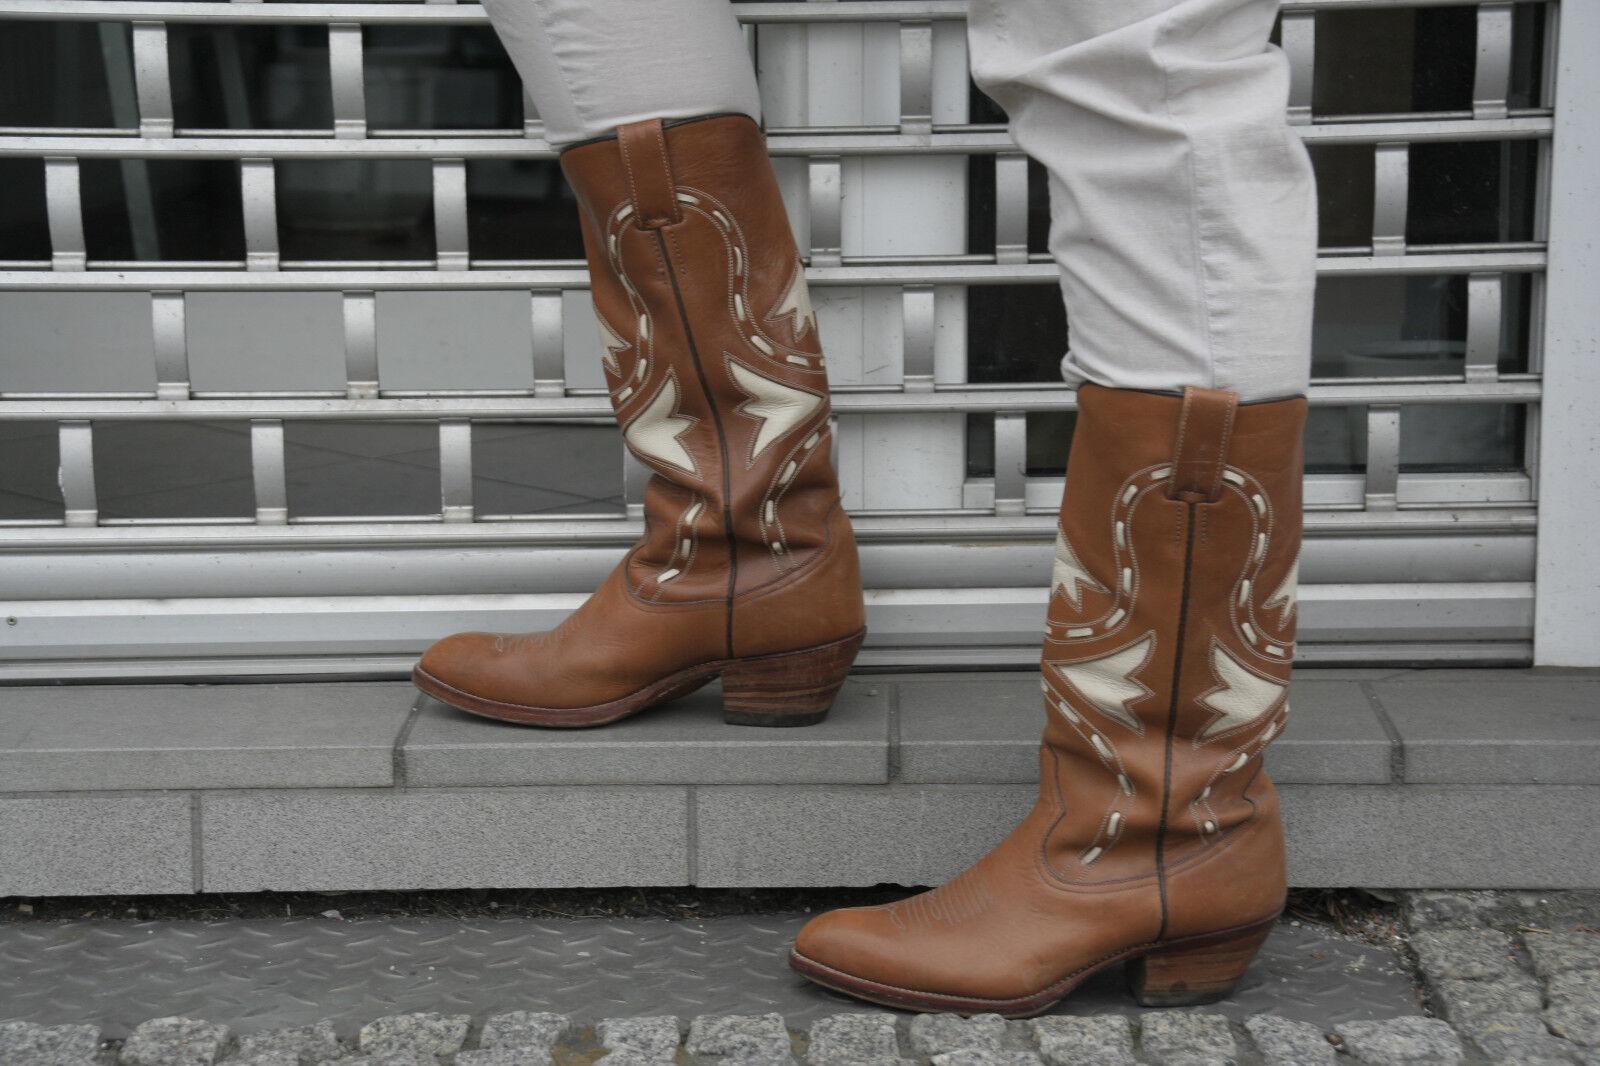 Mora CUSTOM Boots tg. 8,5 Pelle True Vintage 90s Vera Pelle 8,5 Stivali Di Pelle Stivali cowboy a90aee